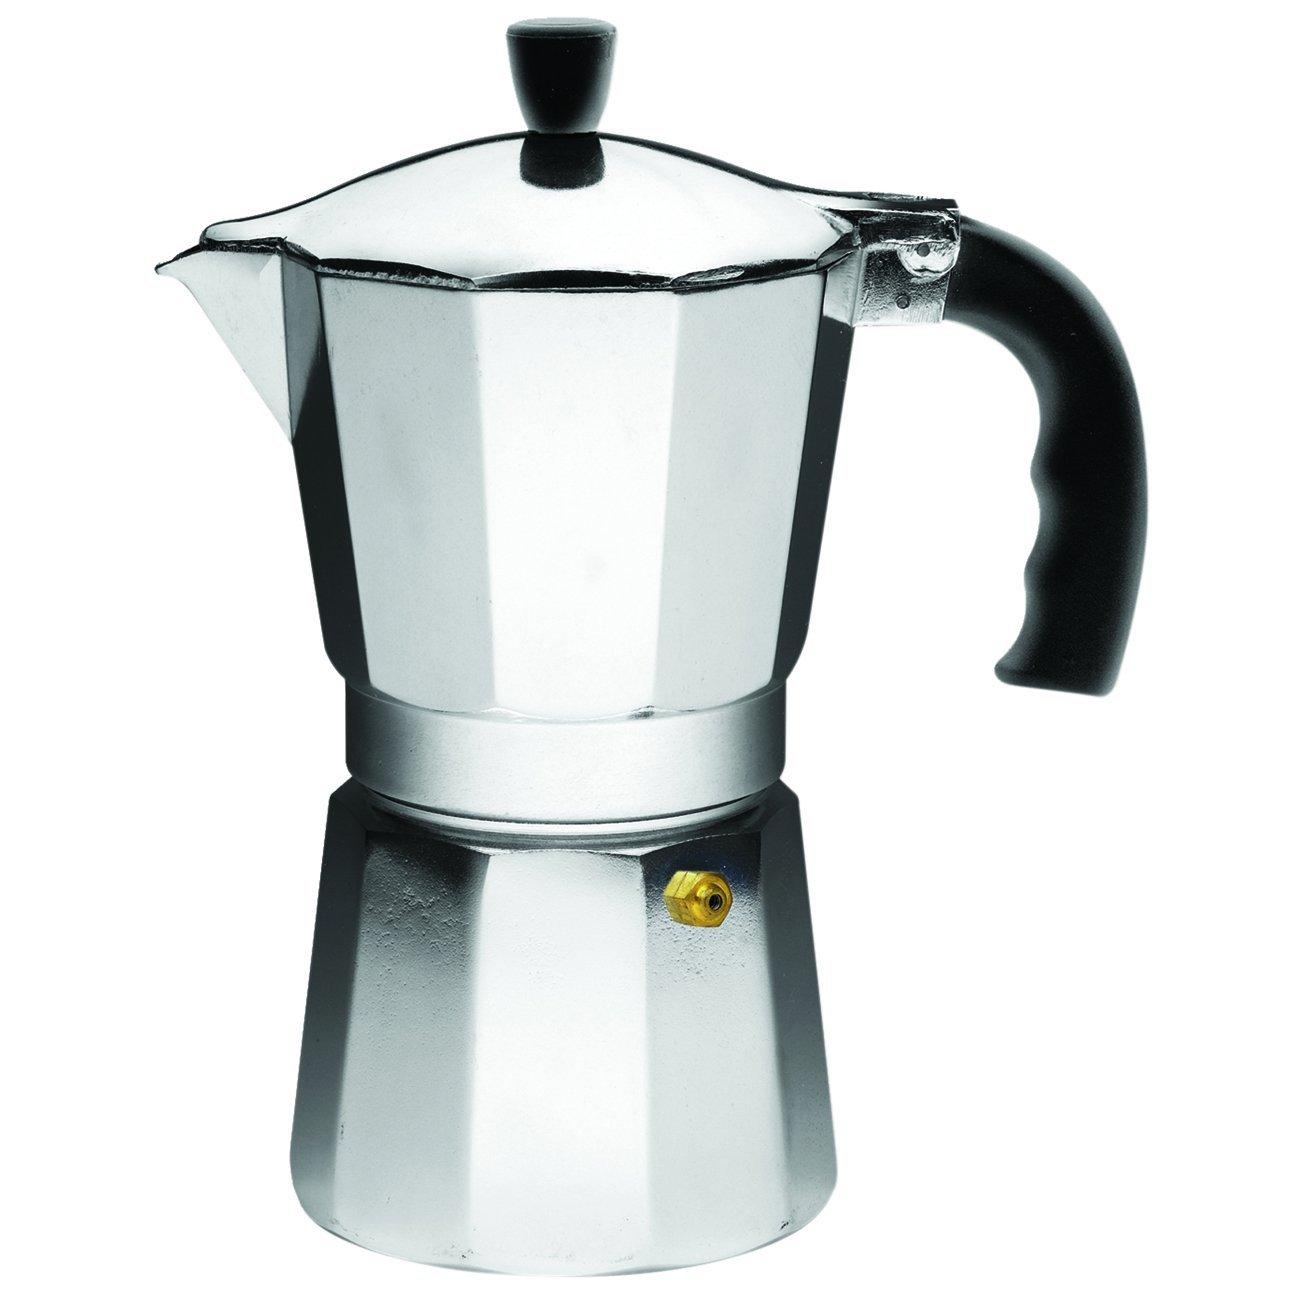 IMUSA Aluminum Espresso Stovetop Coffeemaker 6-cup, Silver [6-Cup] $21.49